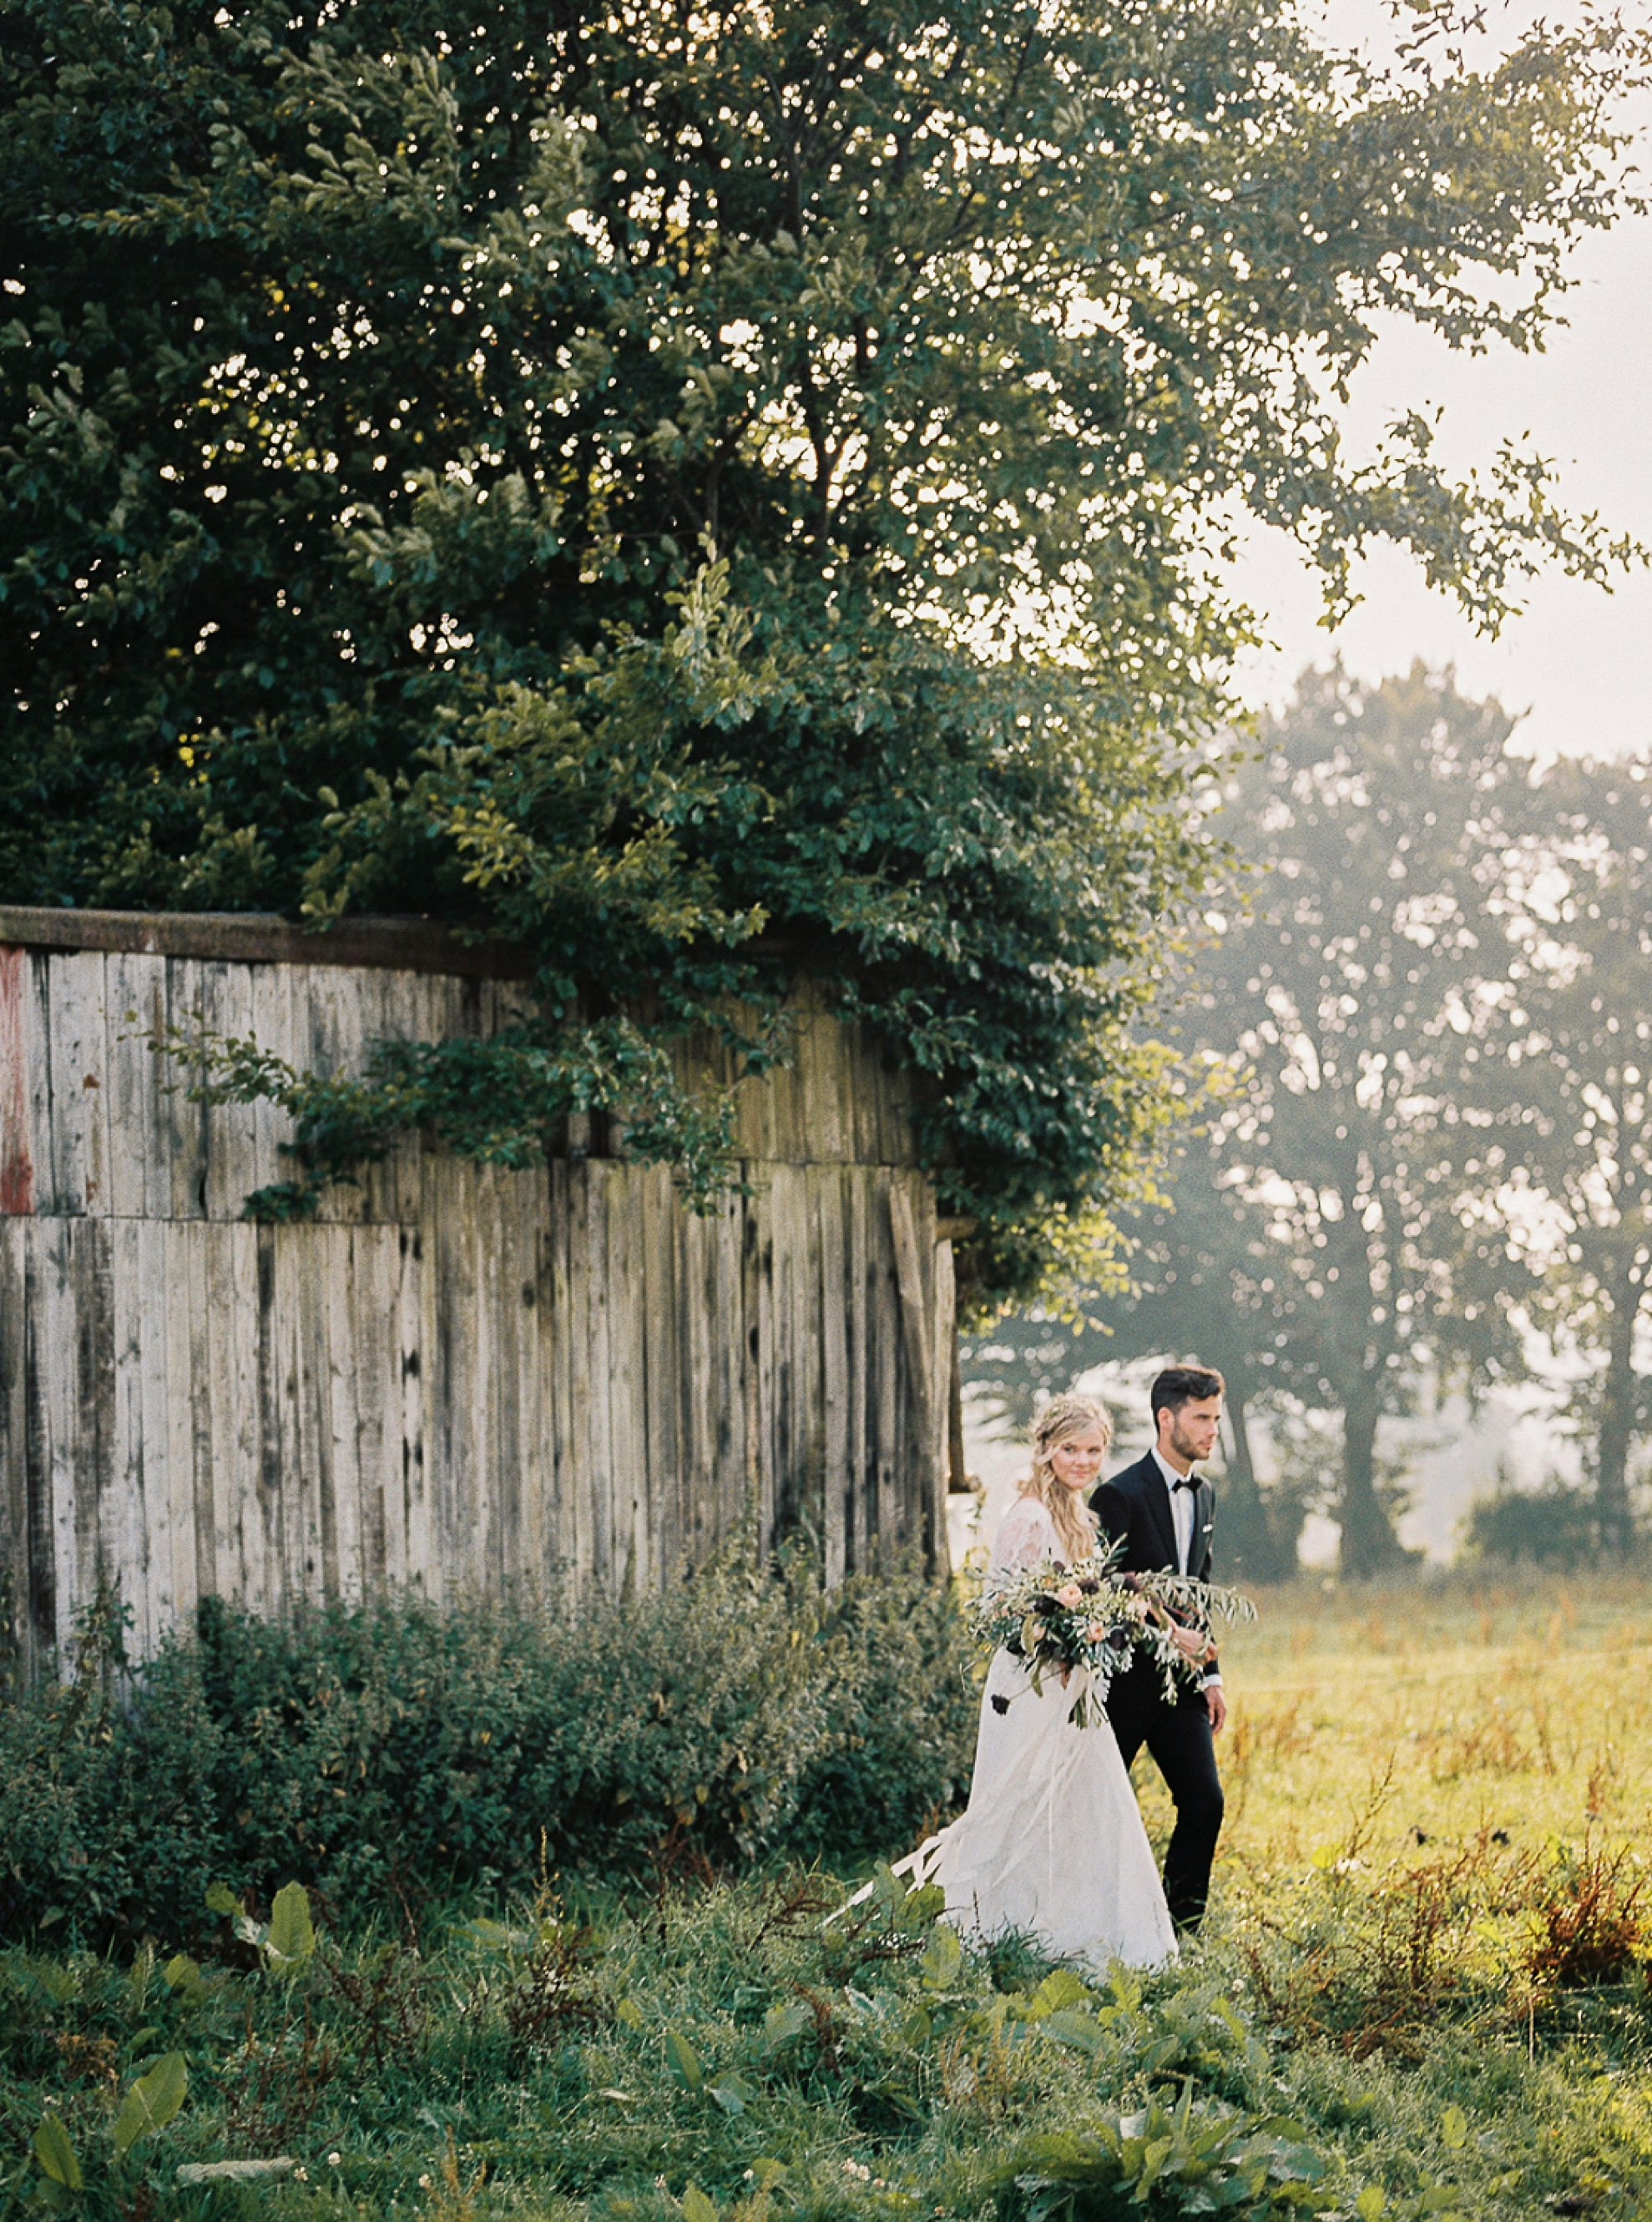 Amanda-Drost-Fotografie-Belgie-Photography-Wedding_0043.jpg